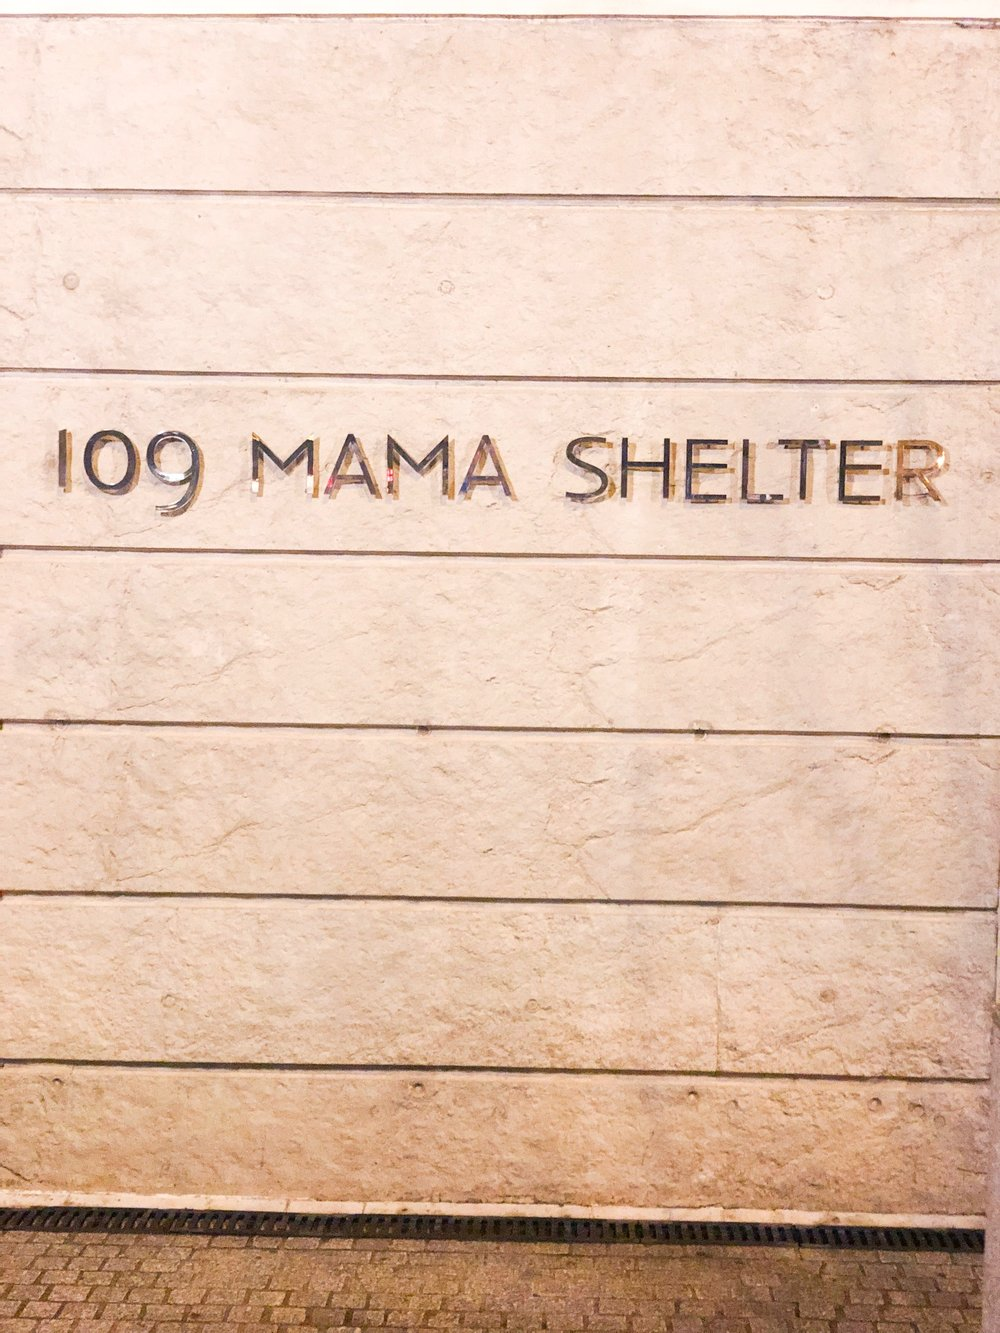 Mama-Shelter-Paris-elisa-les-bons-tuyaux.JPG